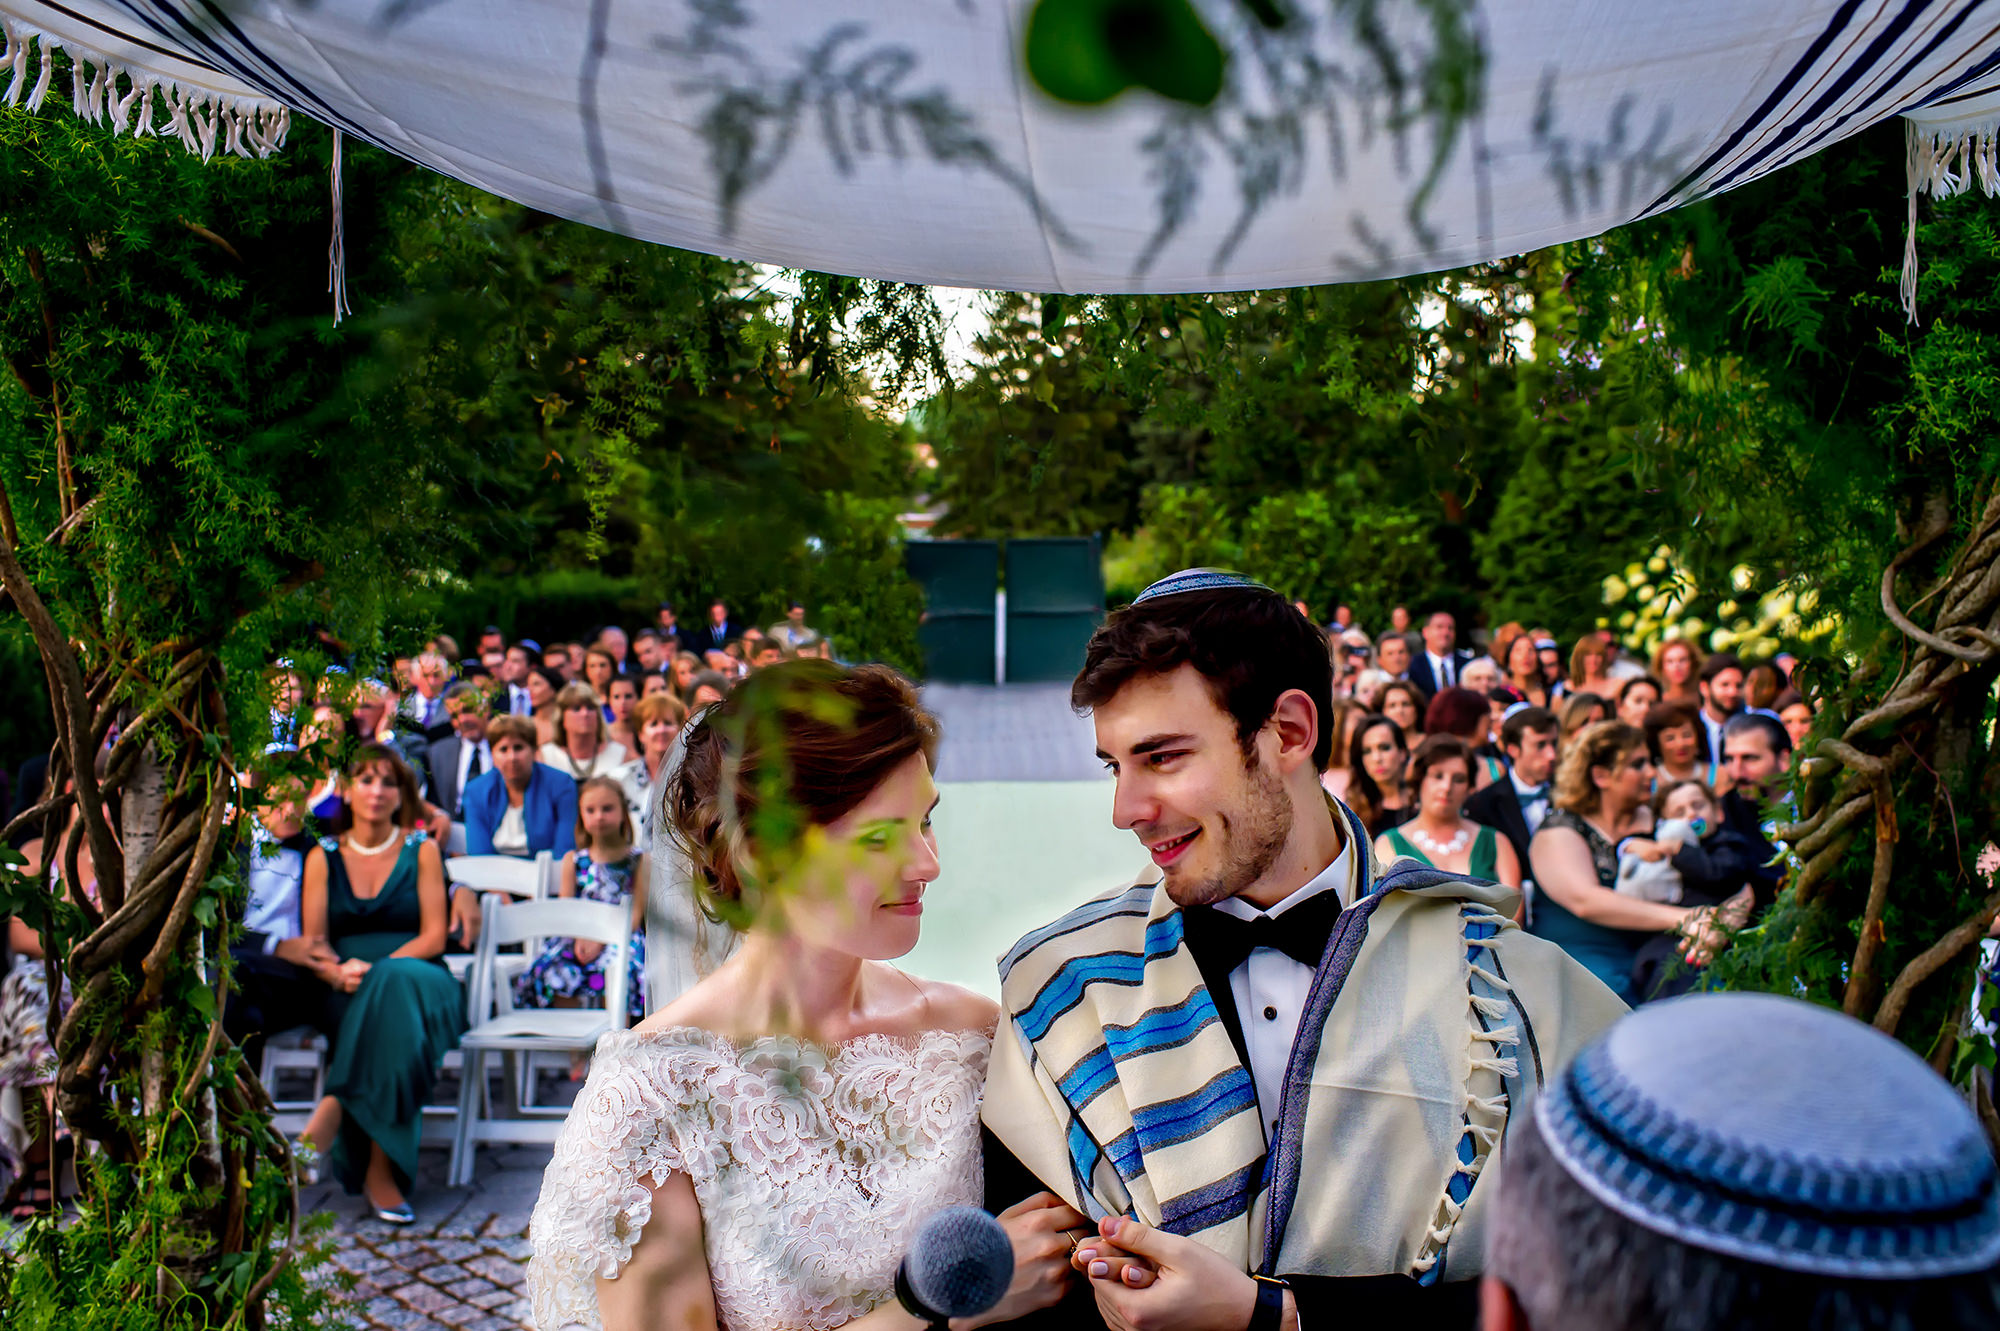 Rachel & Andres' wedding at the New York Botanical Gardens in Bronx, NY